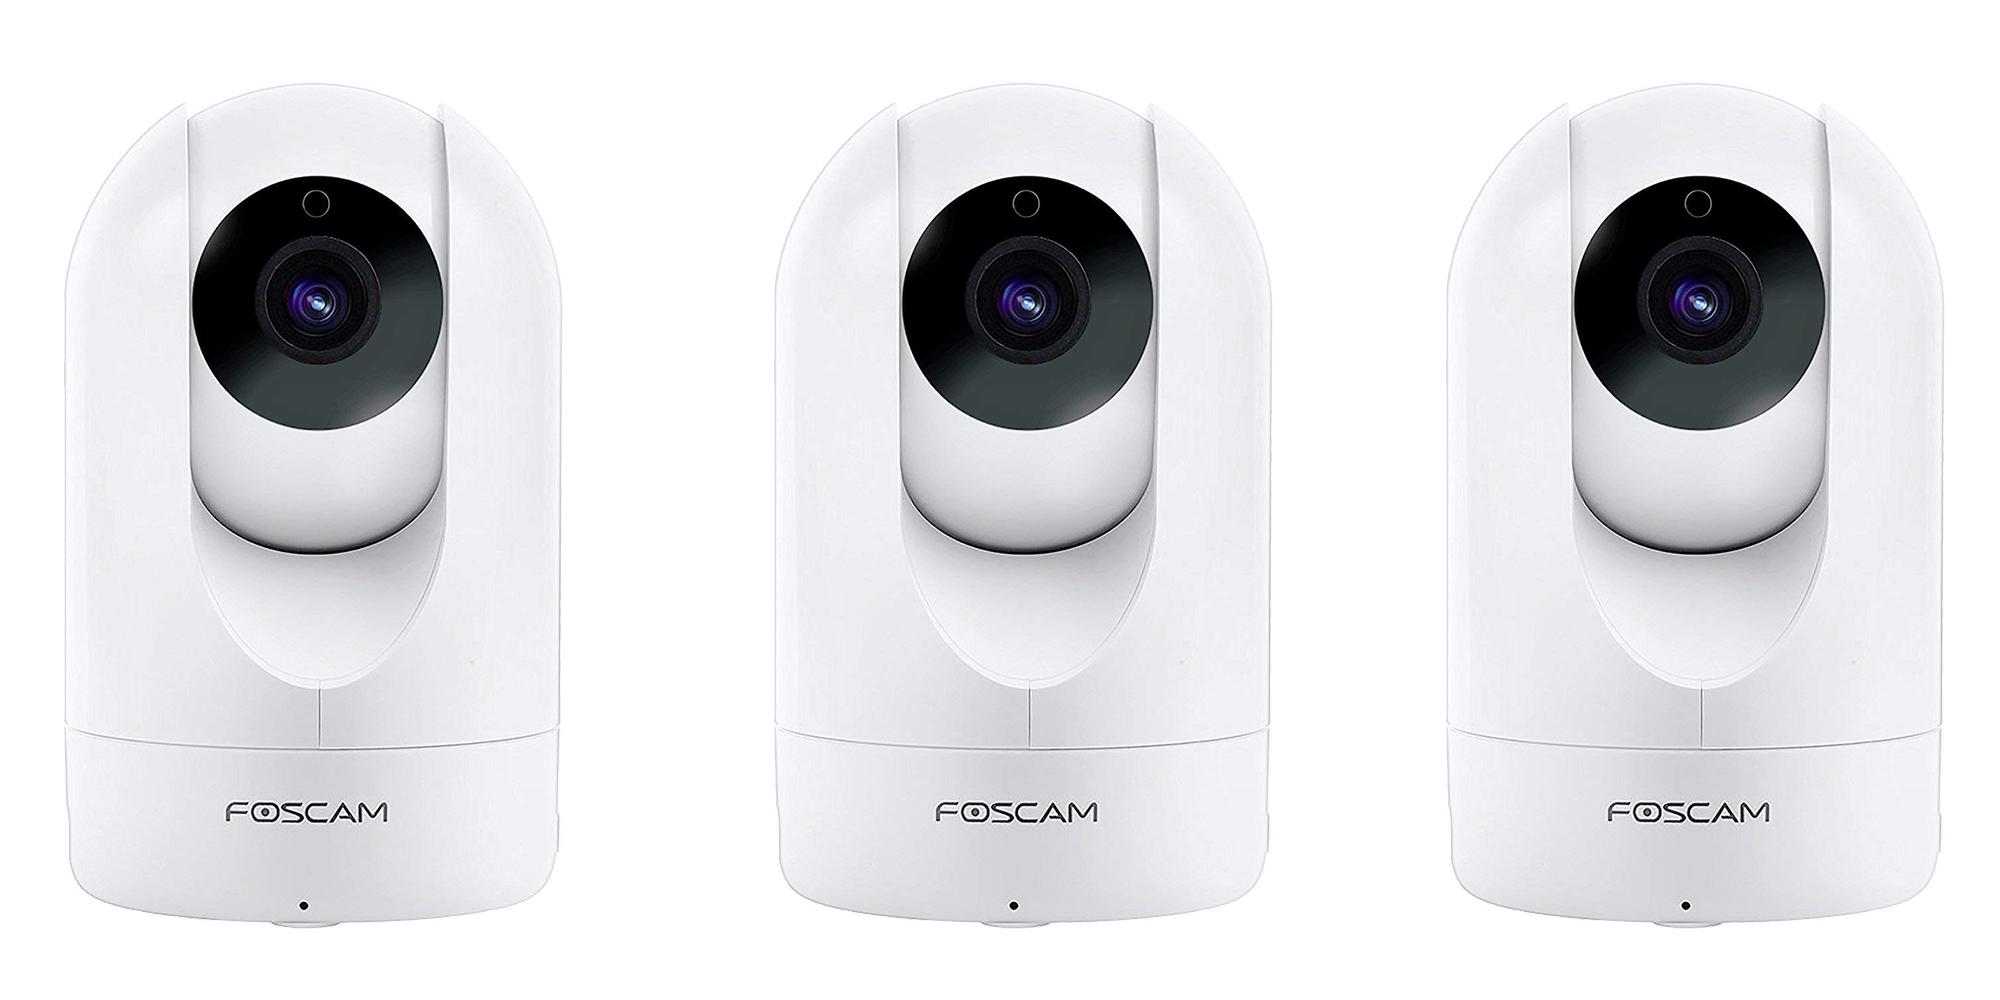 Surveil your home w/ Foscam's 1080p Wi-Fi Pan/Tilt/Zoom Camera at $70 (Reg. $85)